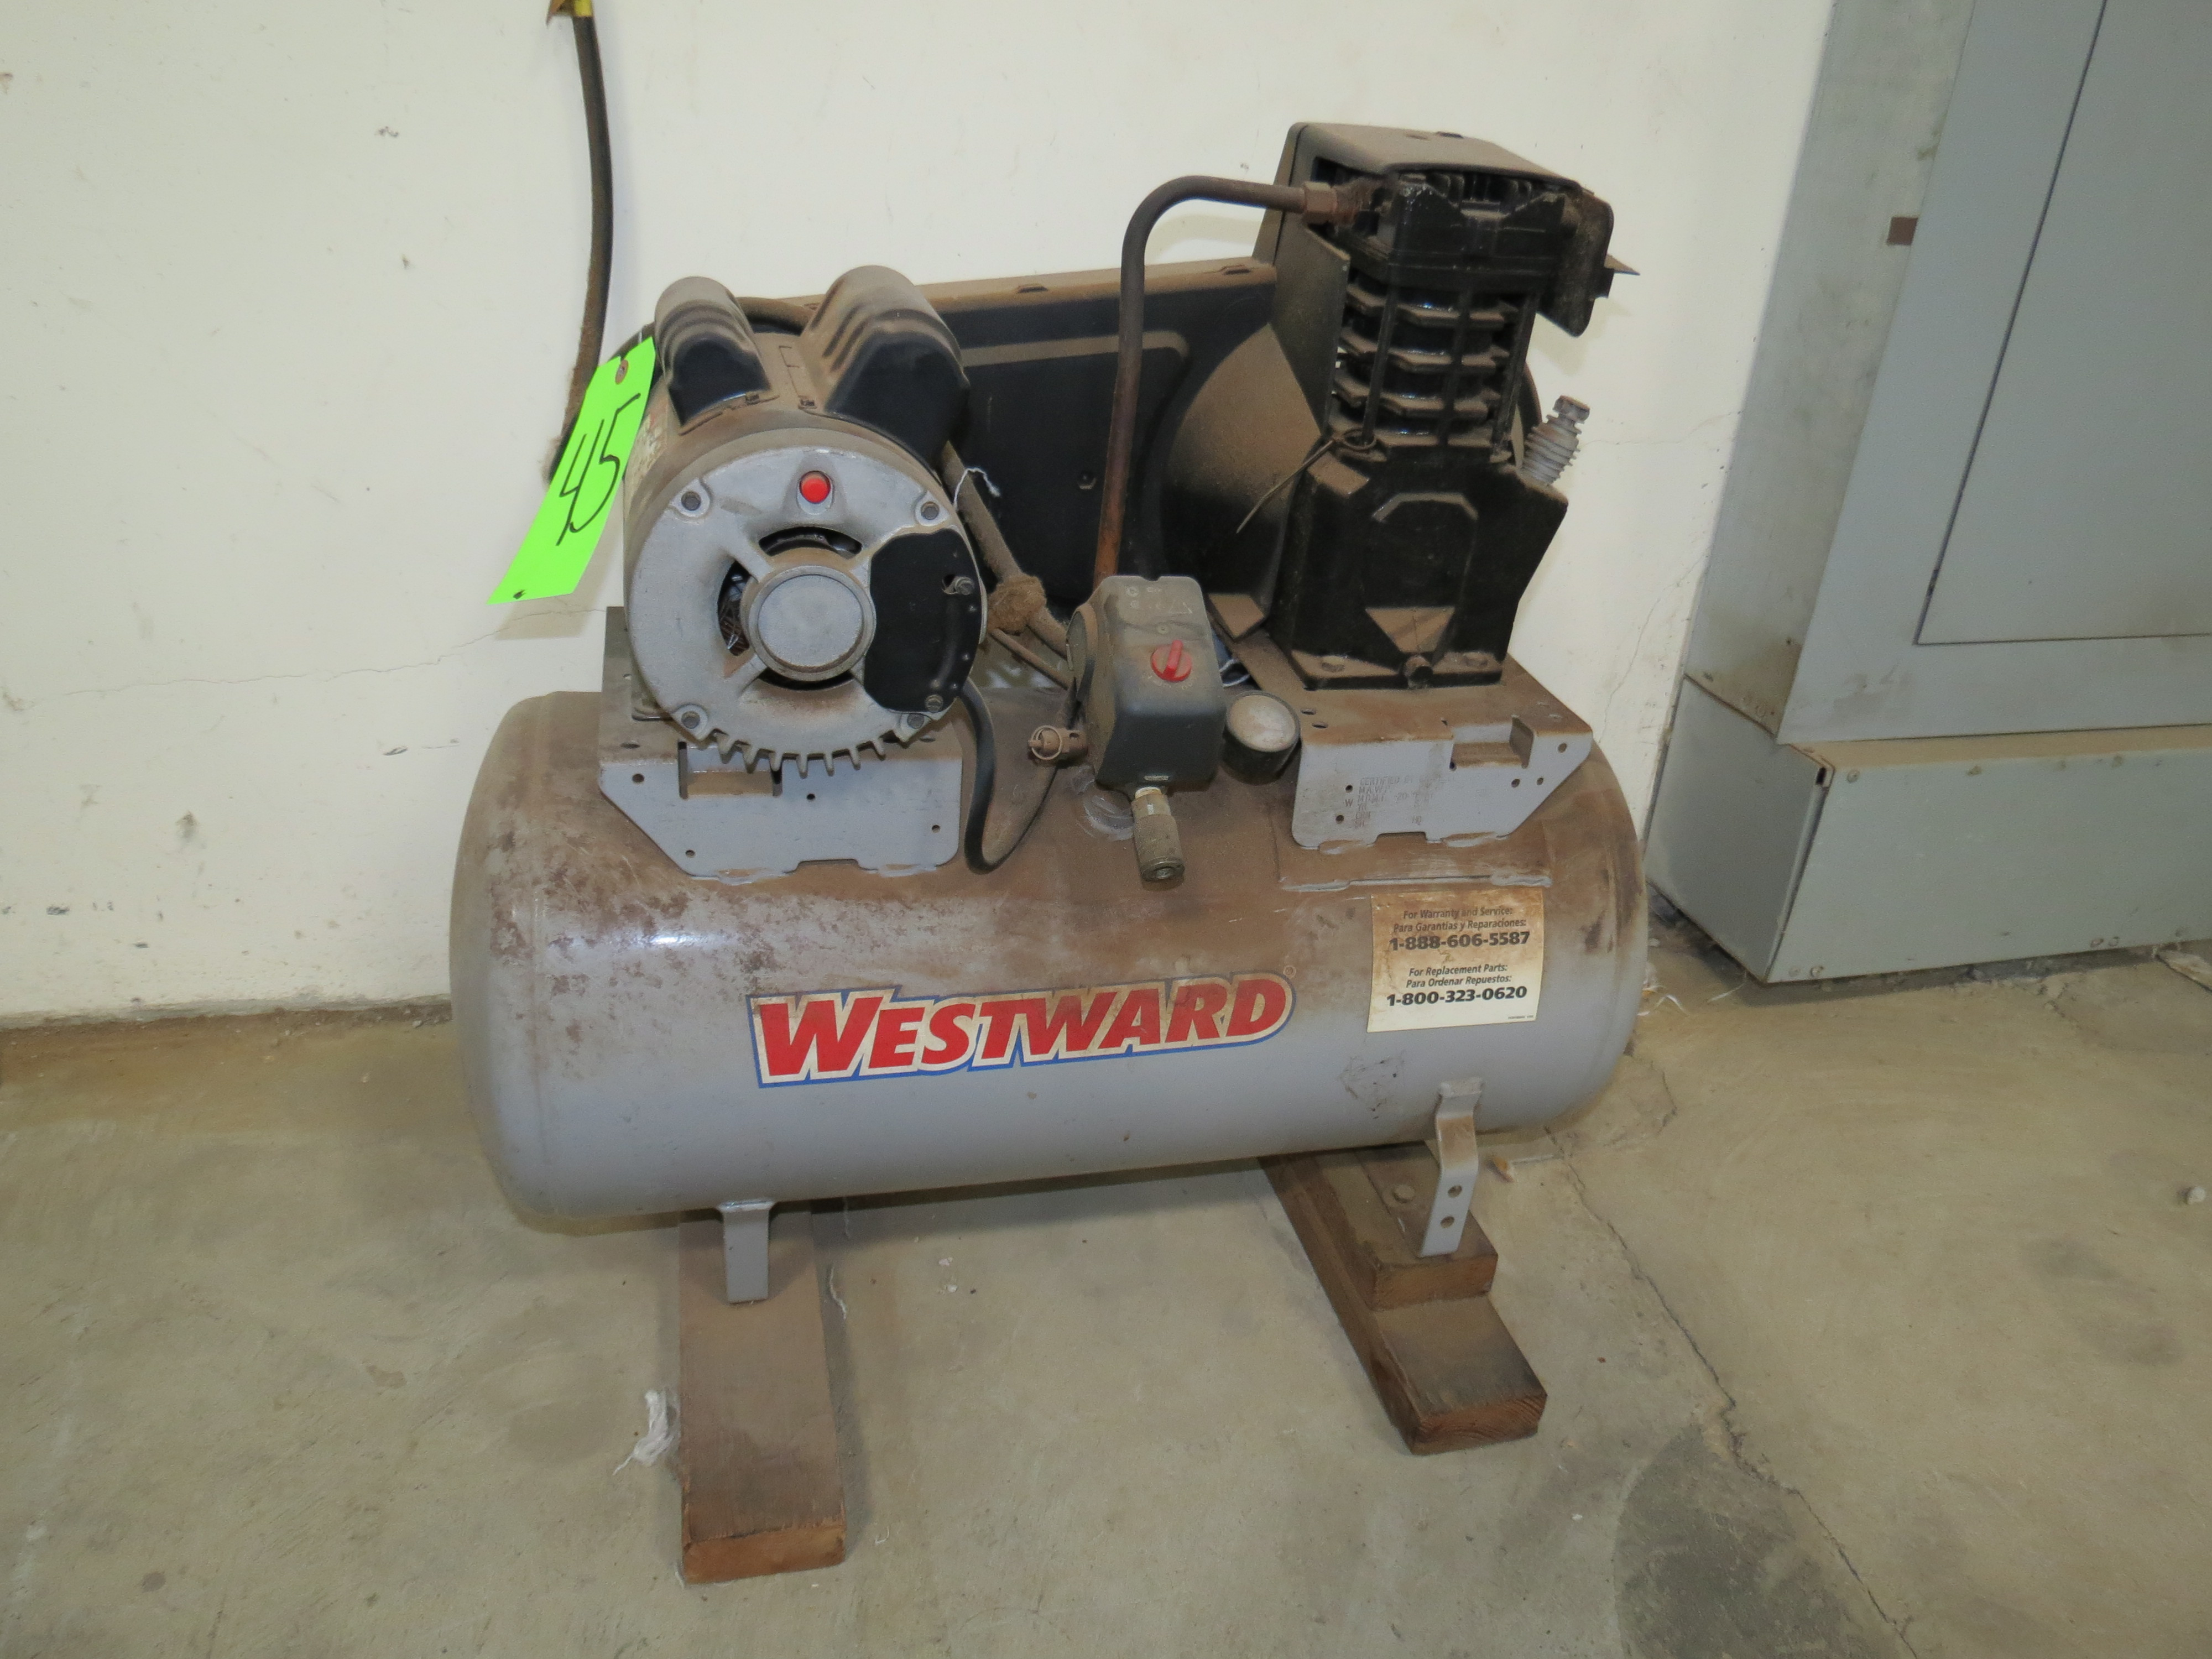 Westward Air Compressor Approximate 8 Gallon Air Tank